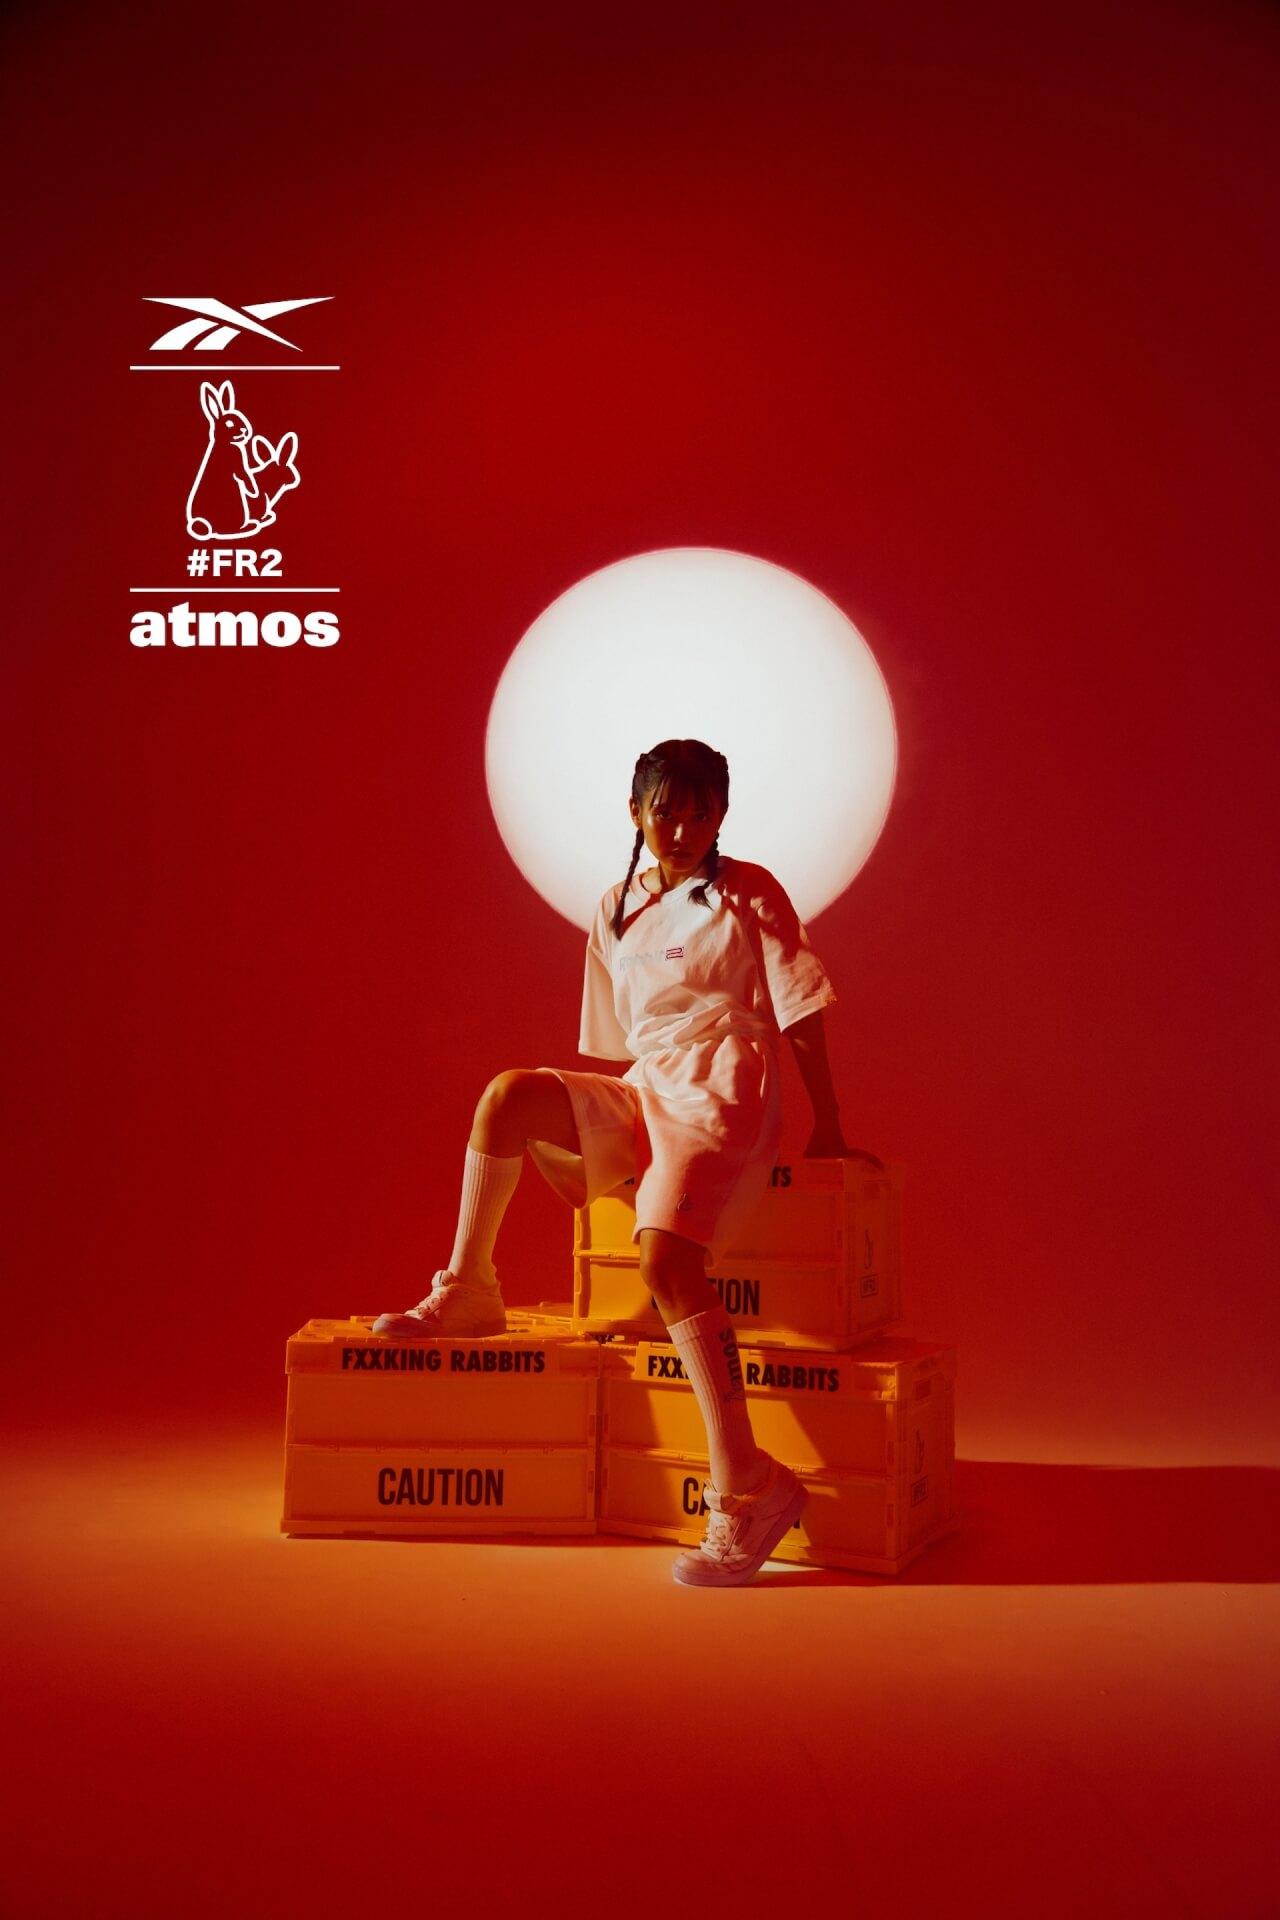 atmosと#FR2のコラボカプセルコレクションが発売!リーボック「CLUB C」ベースのスニーカーも登場 life210621_atmos_fr2_3